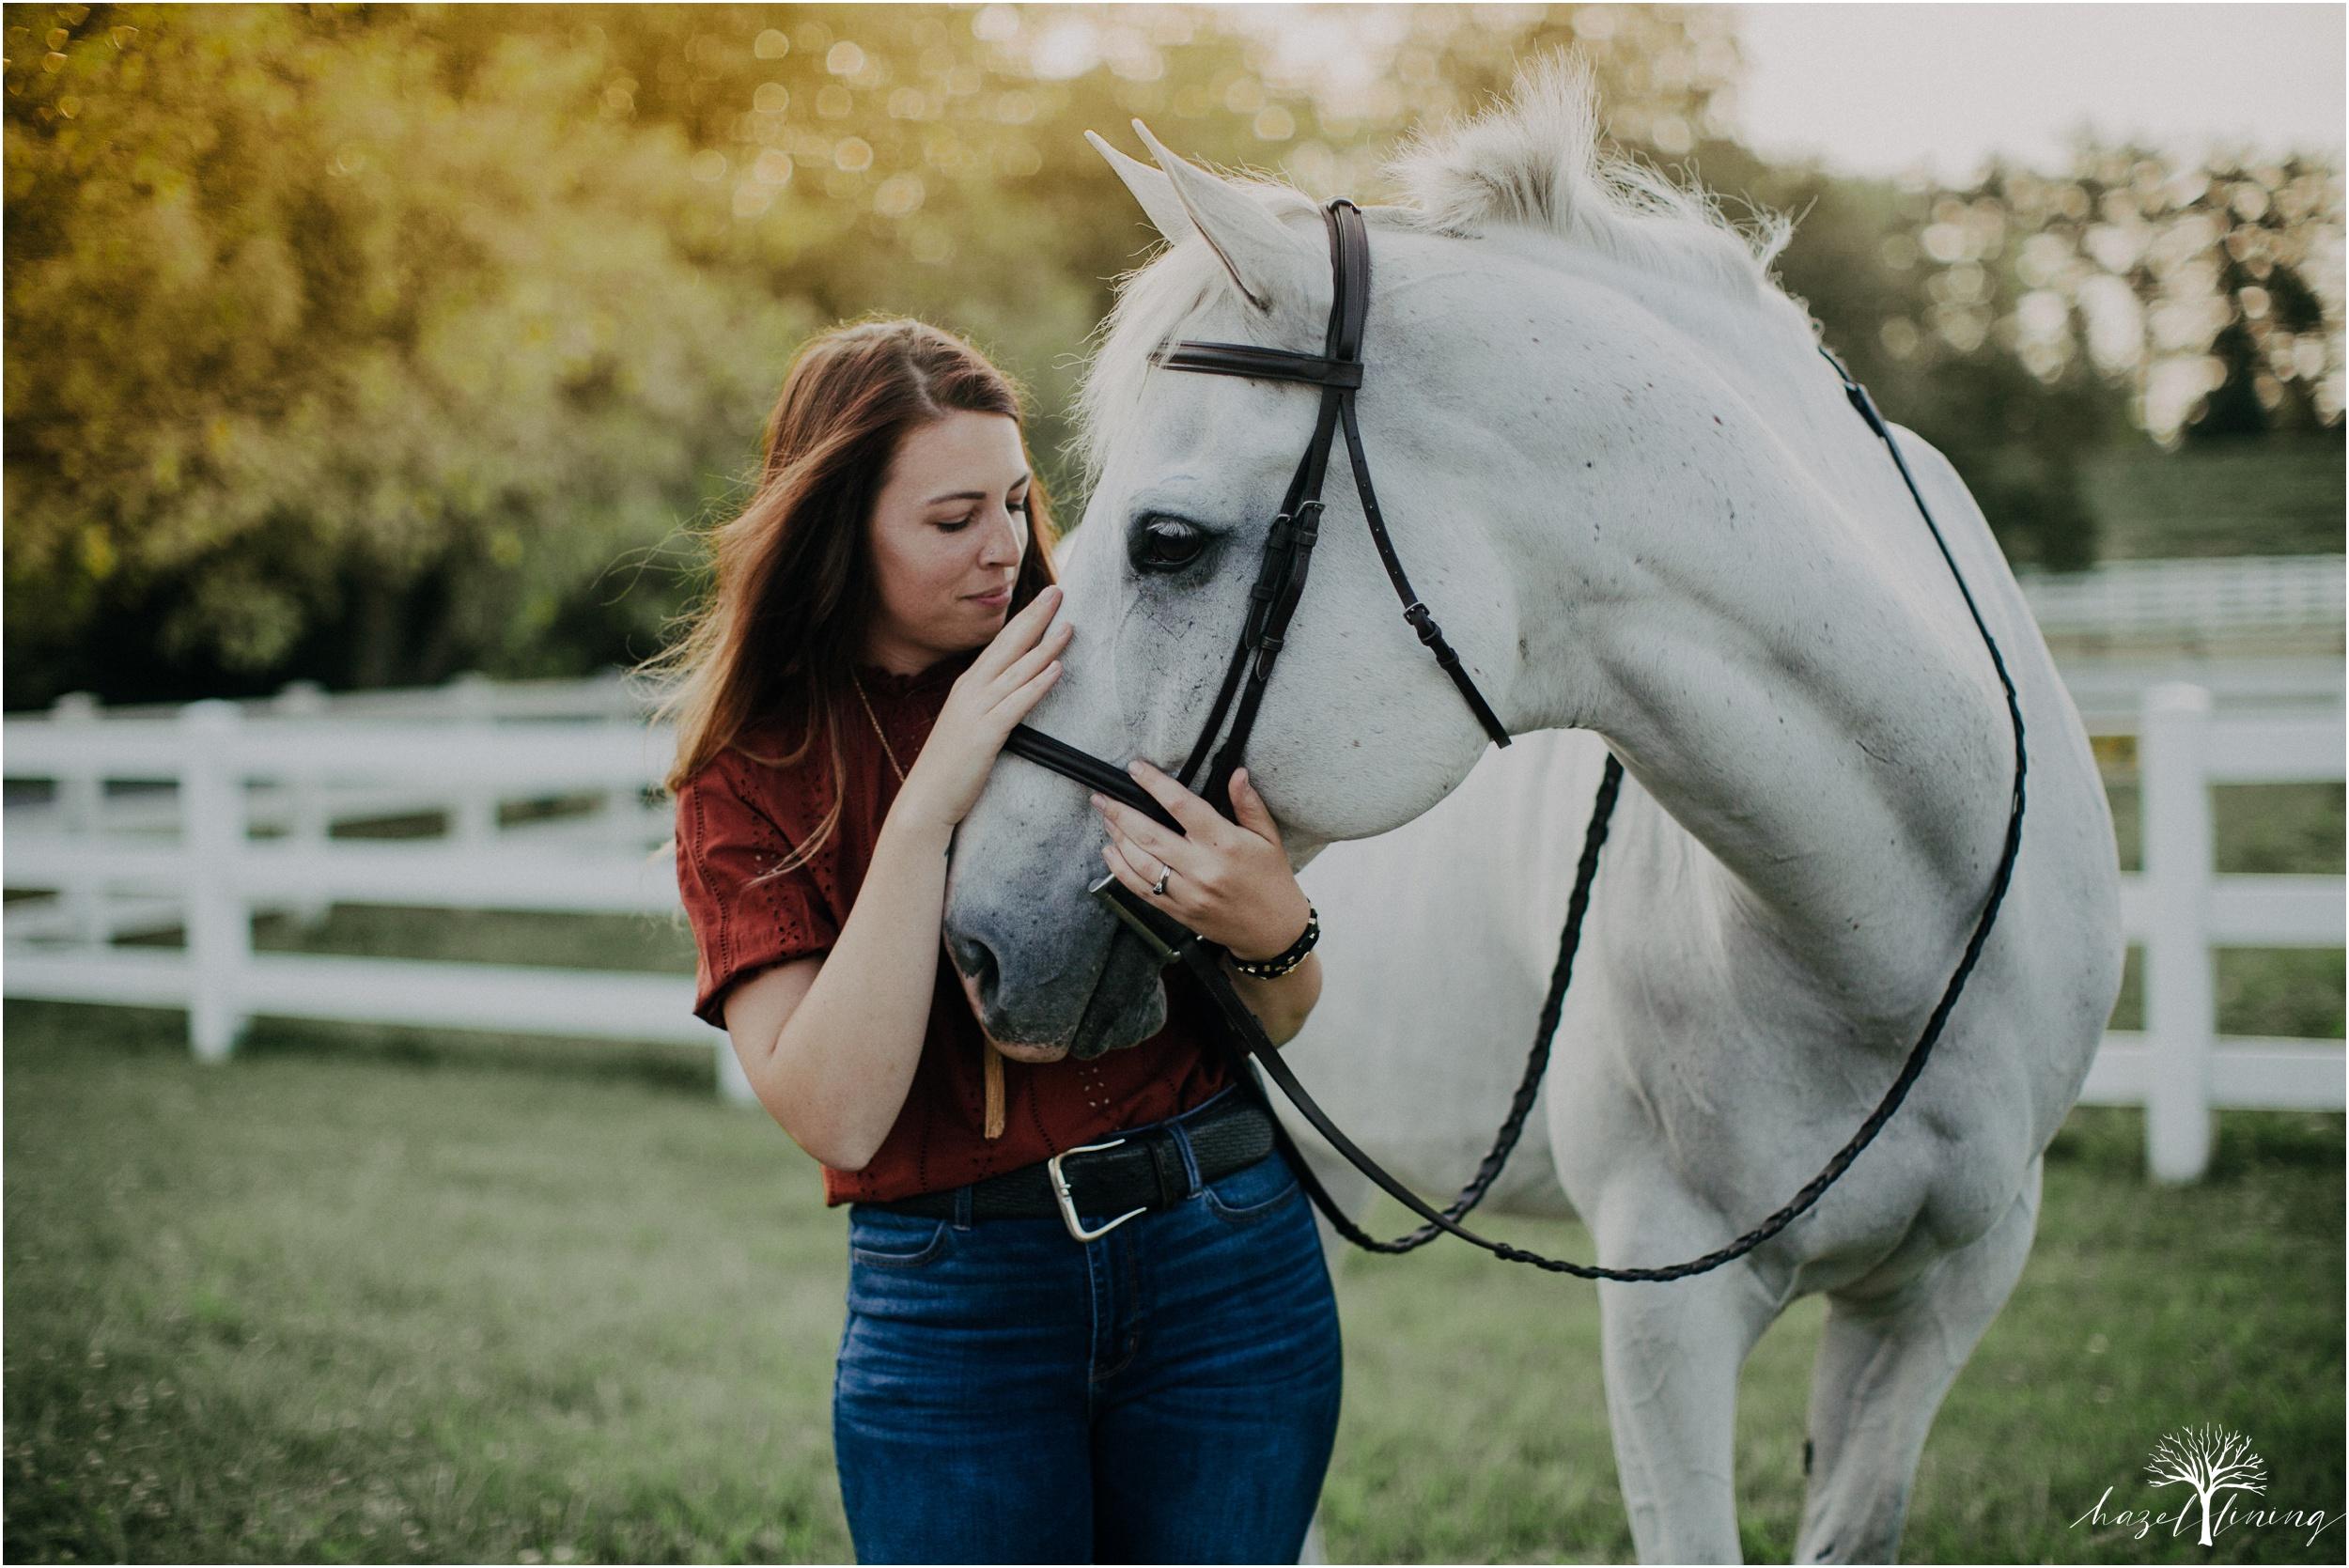 taylor-adams-and-horse-delaware-valley-university-delval-summer-equestrian-portrait-session-hazel-lining-photography-destination-elopement-wedding-engagement-photography_0010.jpg